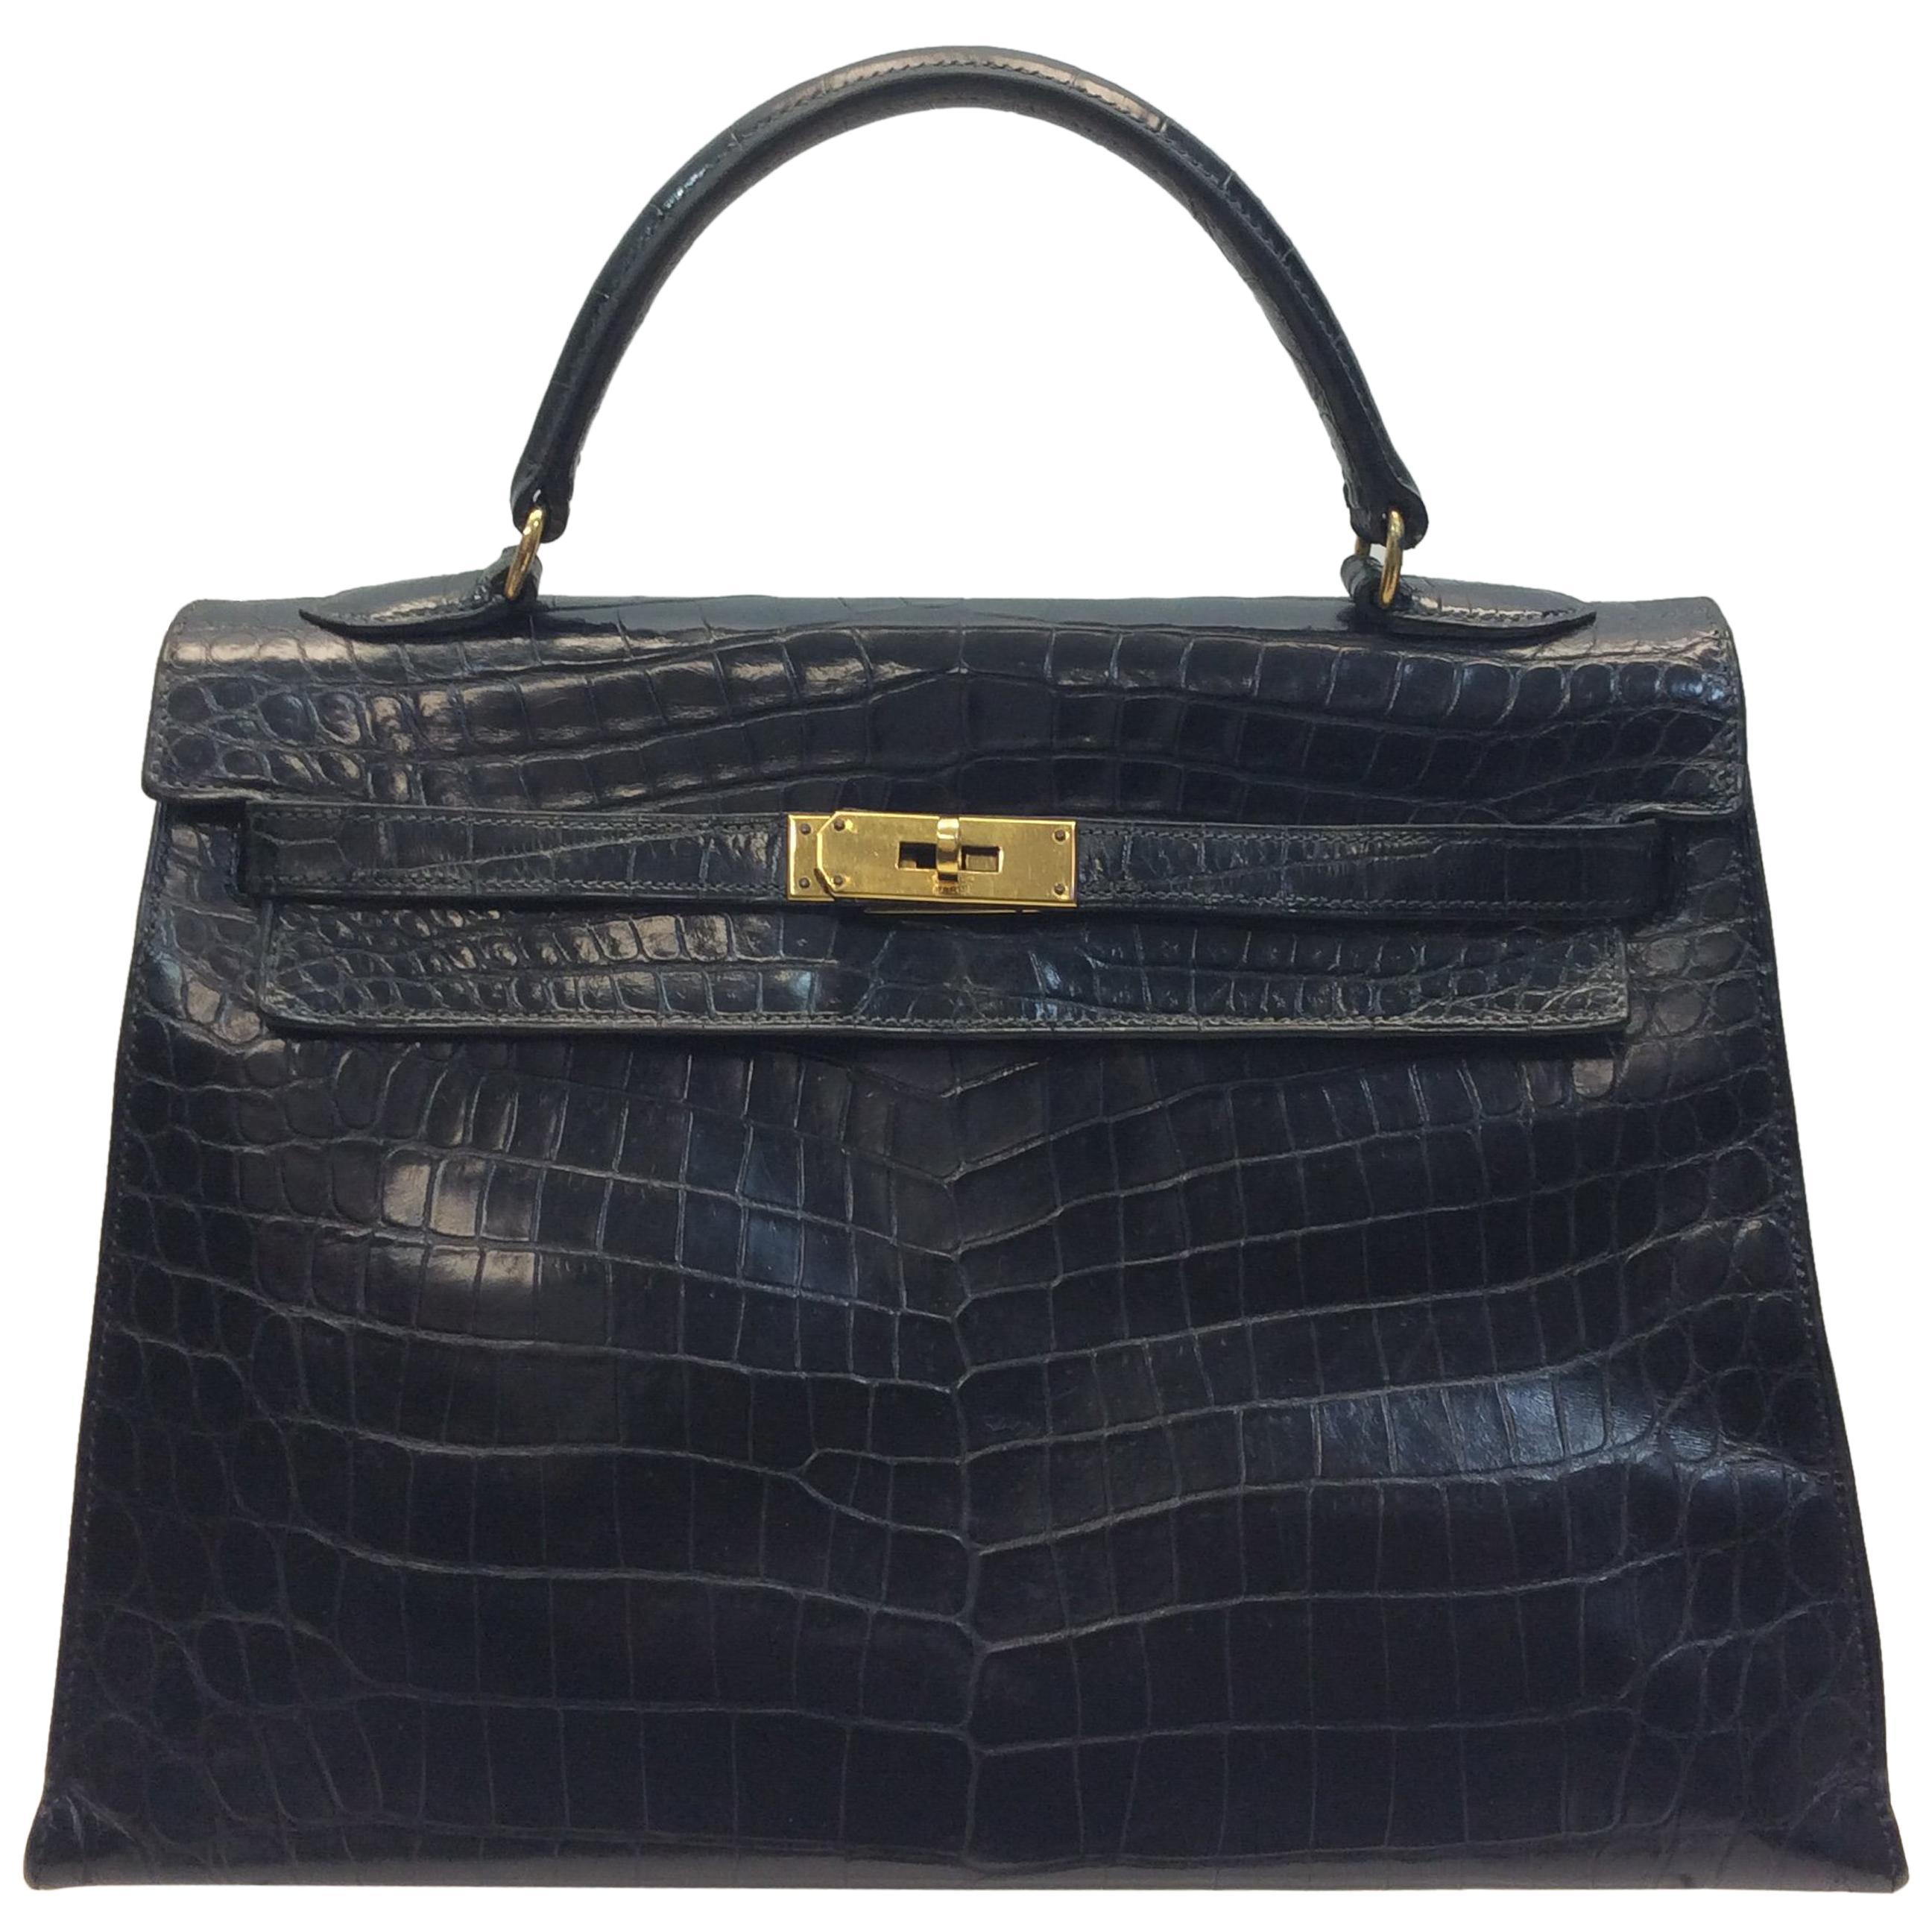 57bea3237472 Hermes Alligator Bags - 79 For Sale on 1stdibs